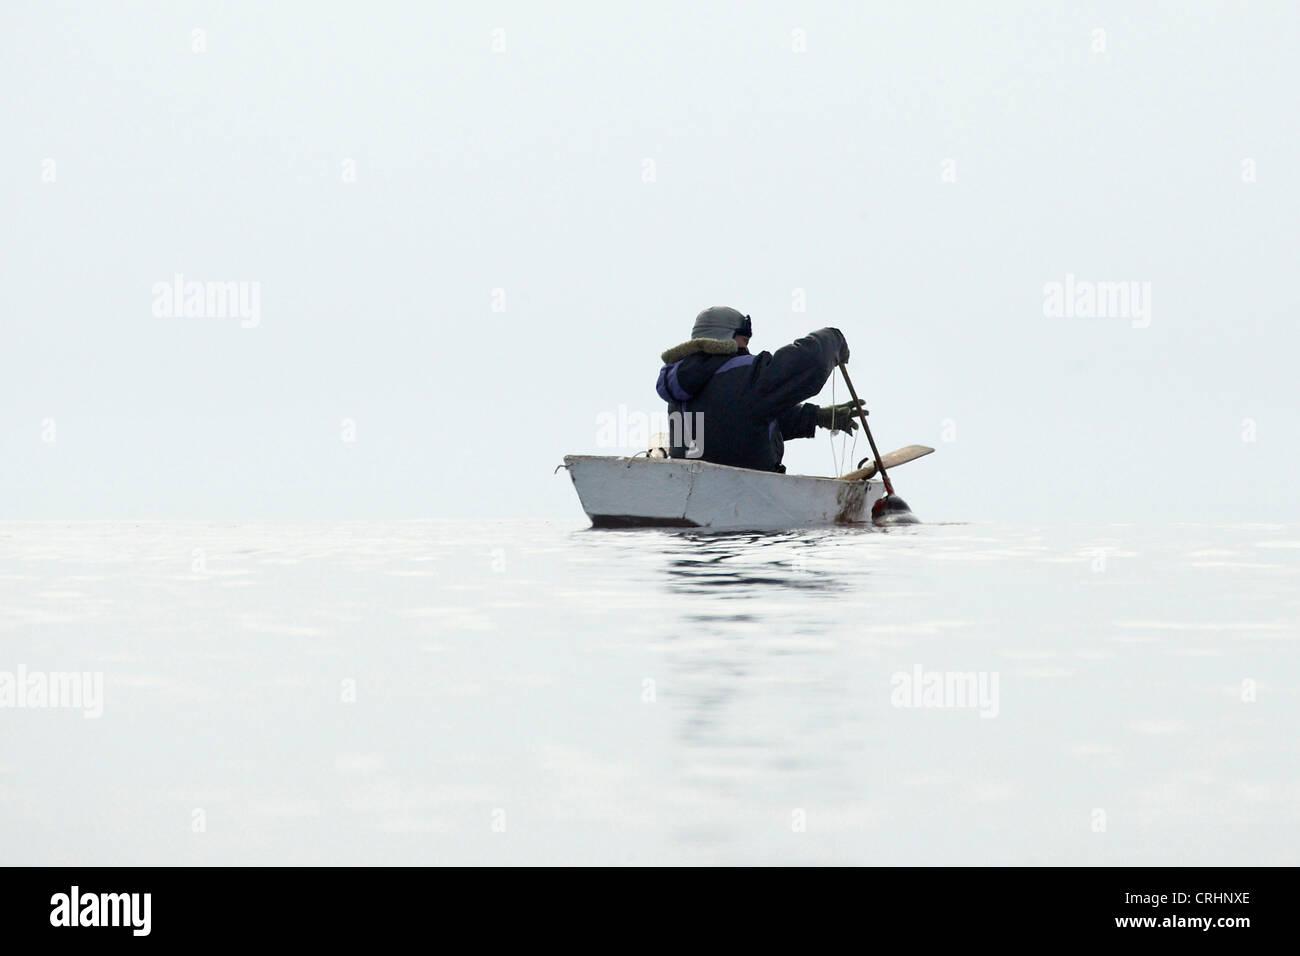 Inuit sealer getting a seal hunted down into his rowing boat, Greenland, Ostgroenland, Tunu, Kalaallit Nunaat, Scoresbysund, - Stock Image